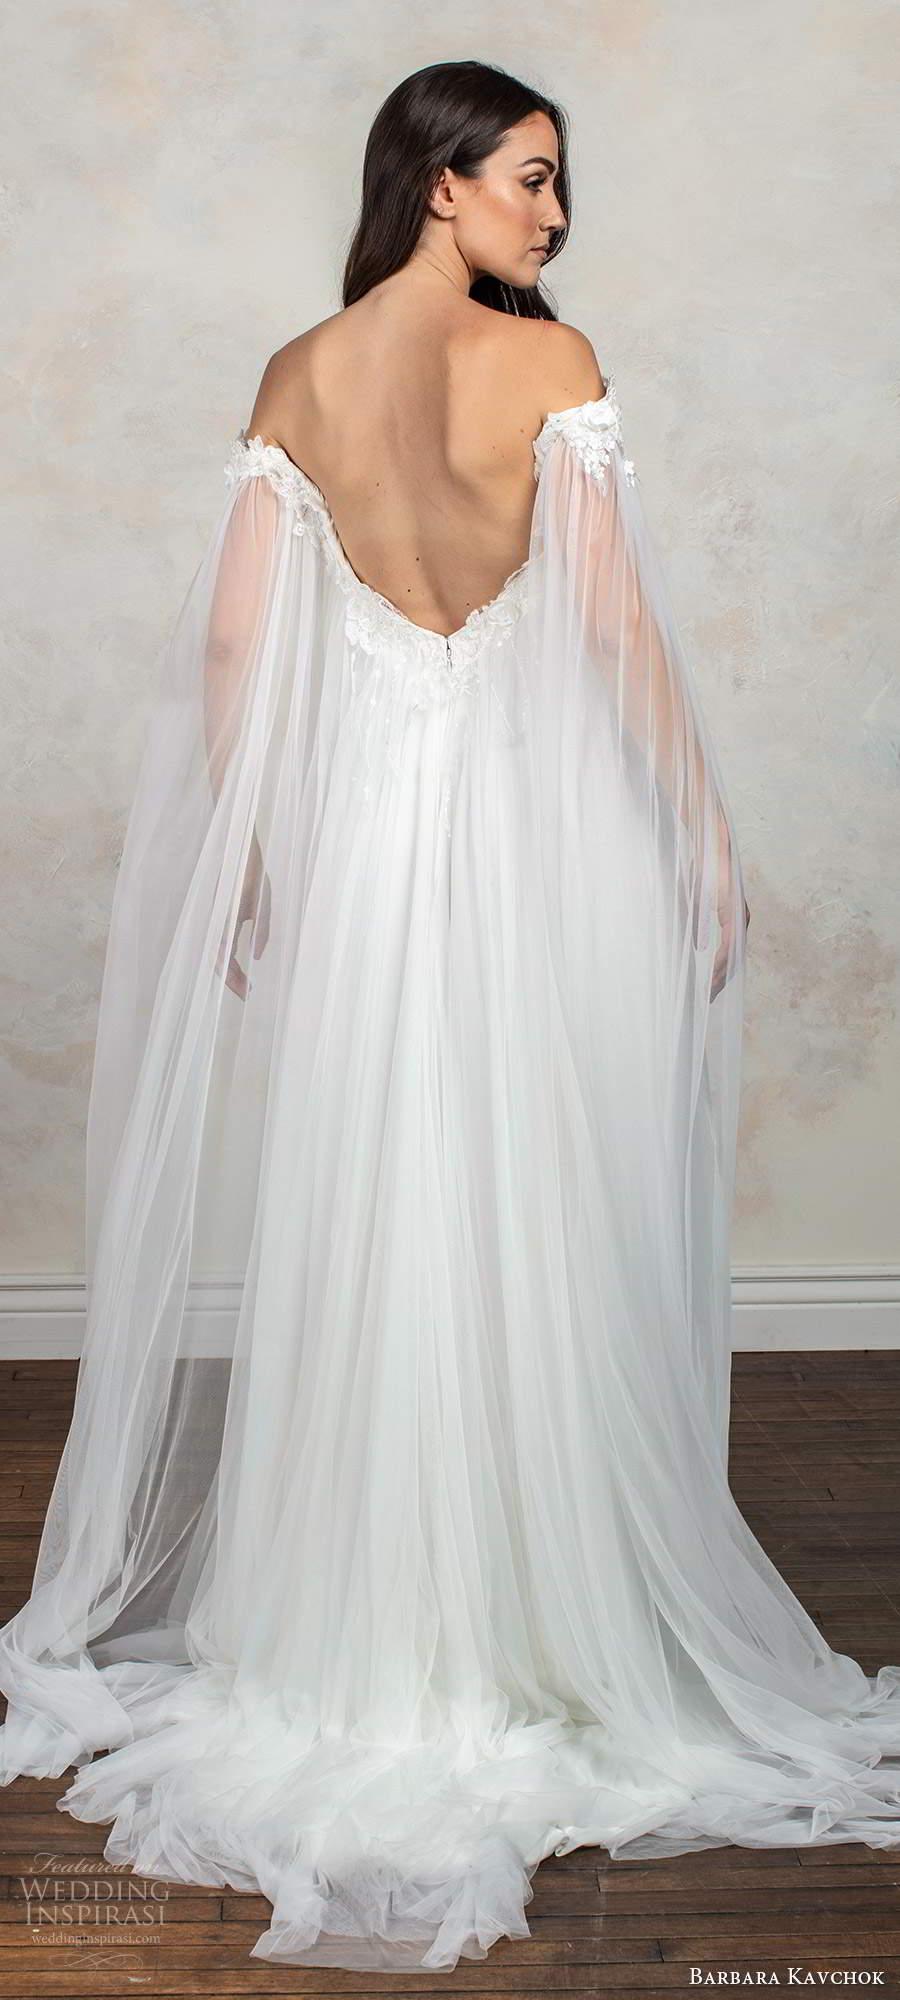 barbara kavchok fall 2020 bridal off shoulder long split sleeves sweetheart neckline embellished bodice slit skirt a line ball gown wedding dress chapel train (5) bv